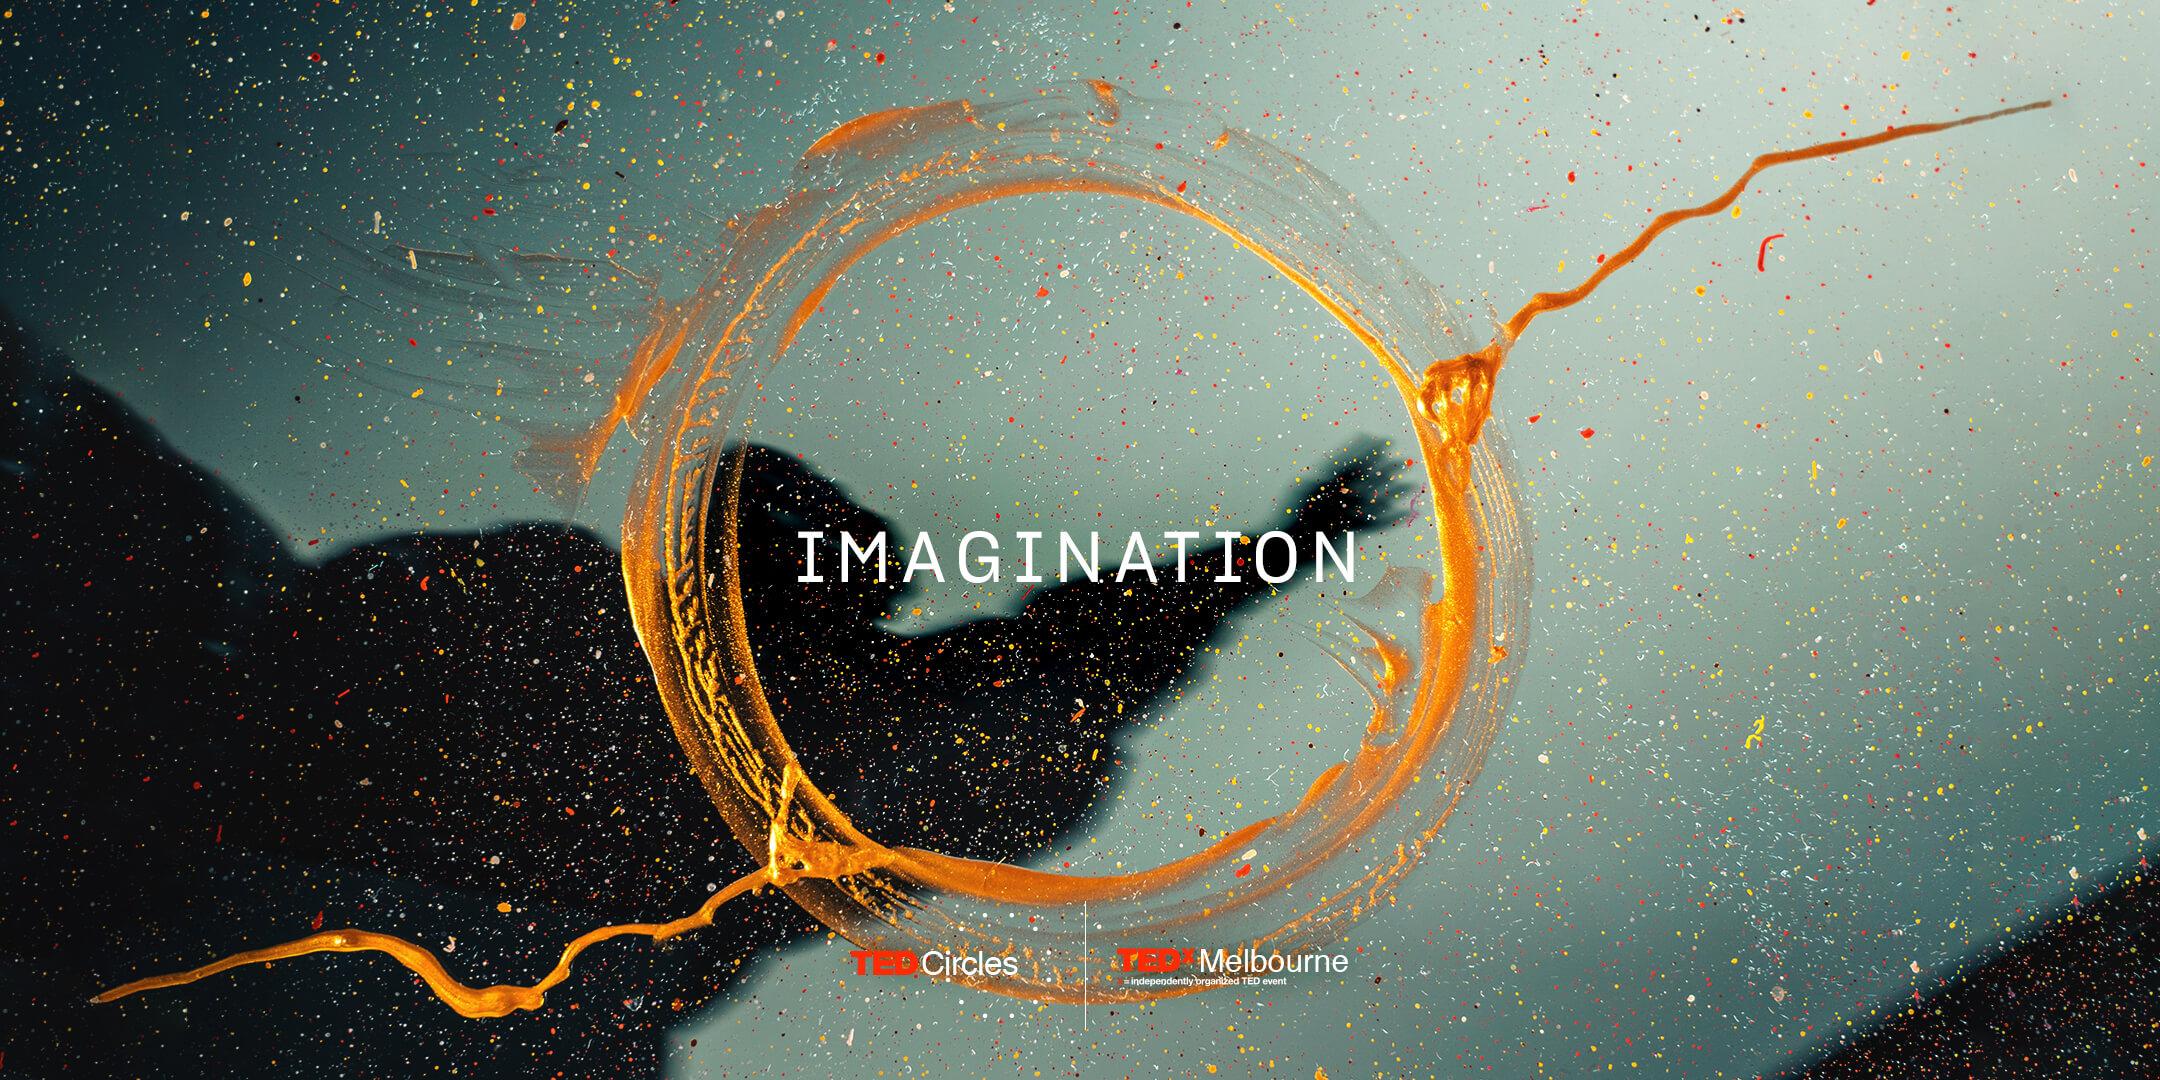 TEDxMelbourne Circle: Imagination